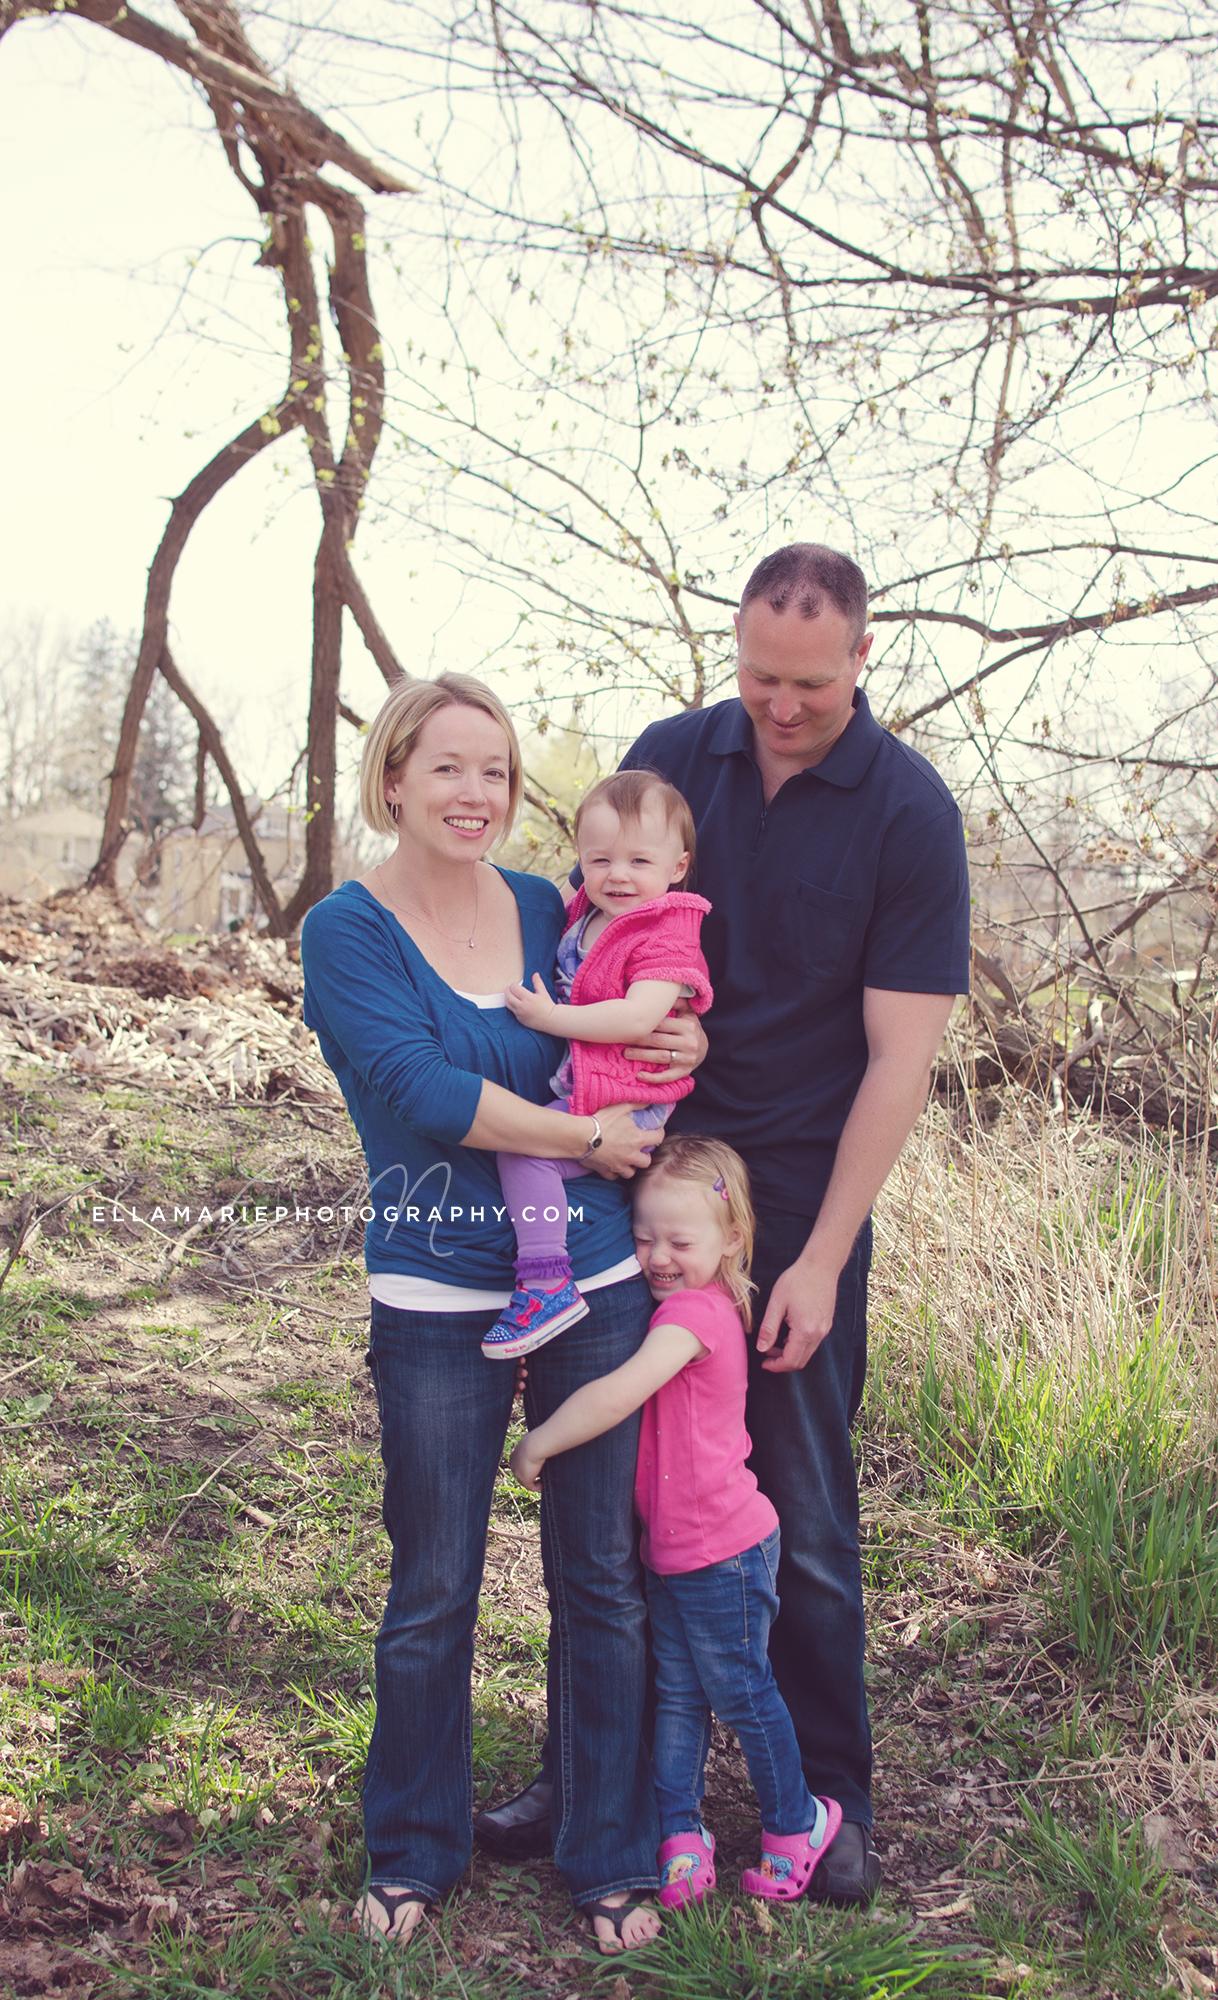 Cain Family 02fb.jpg